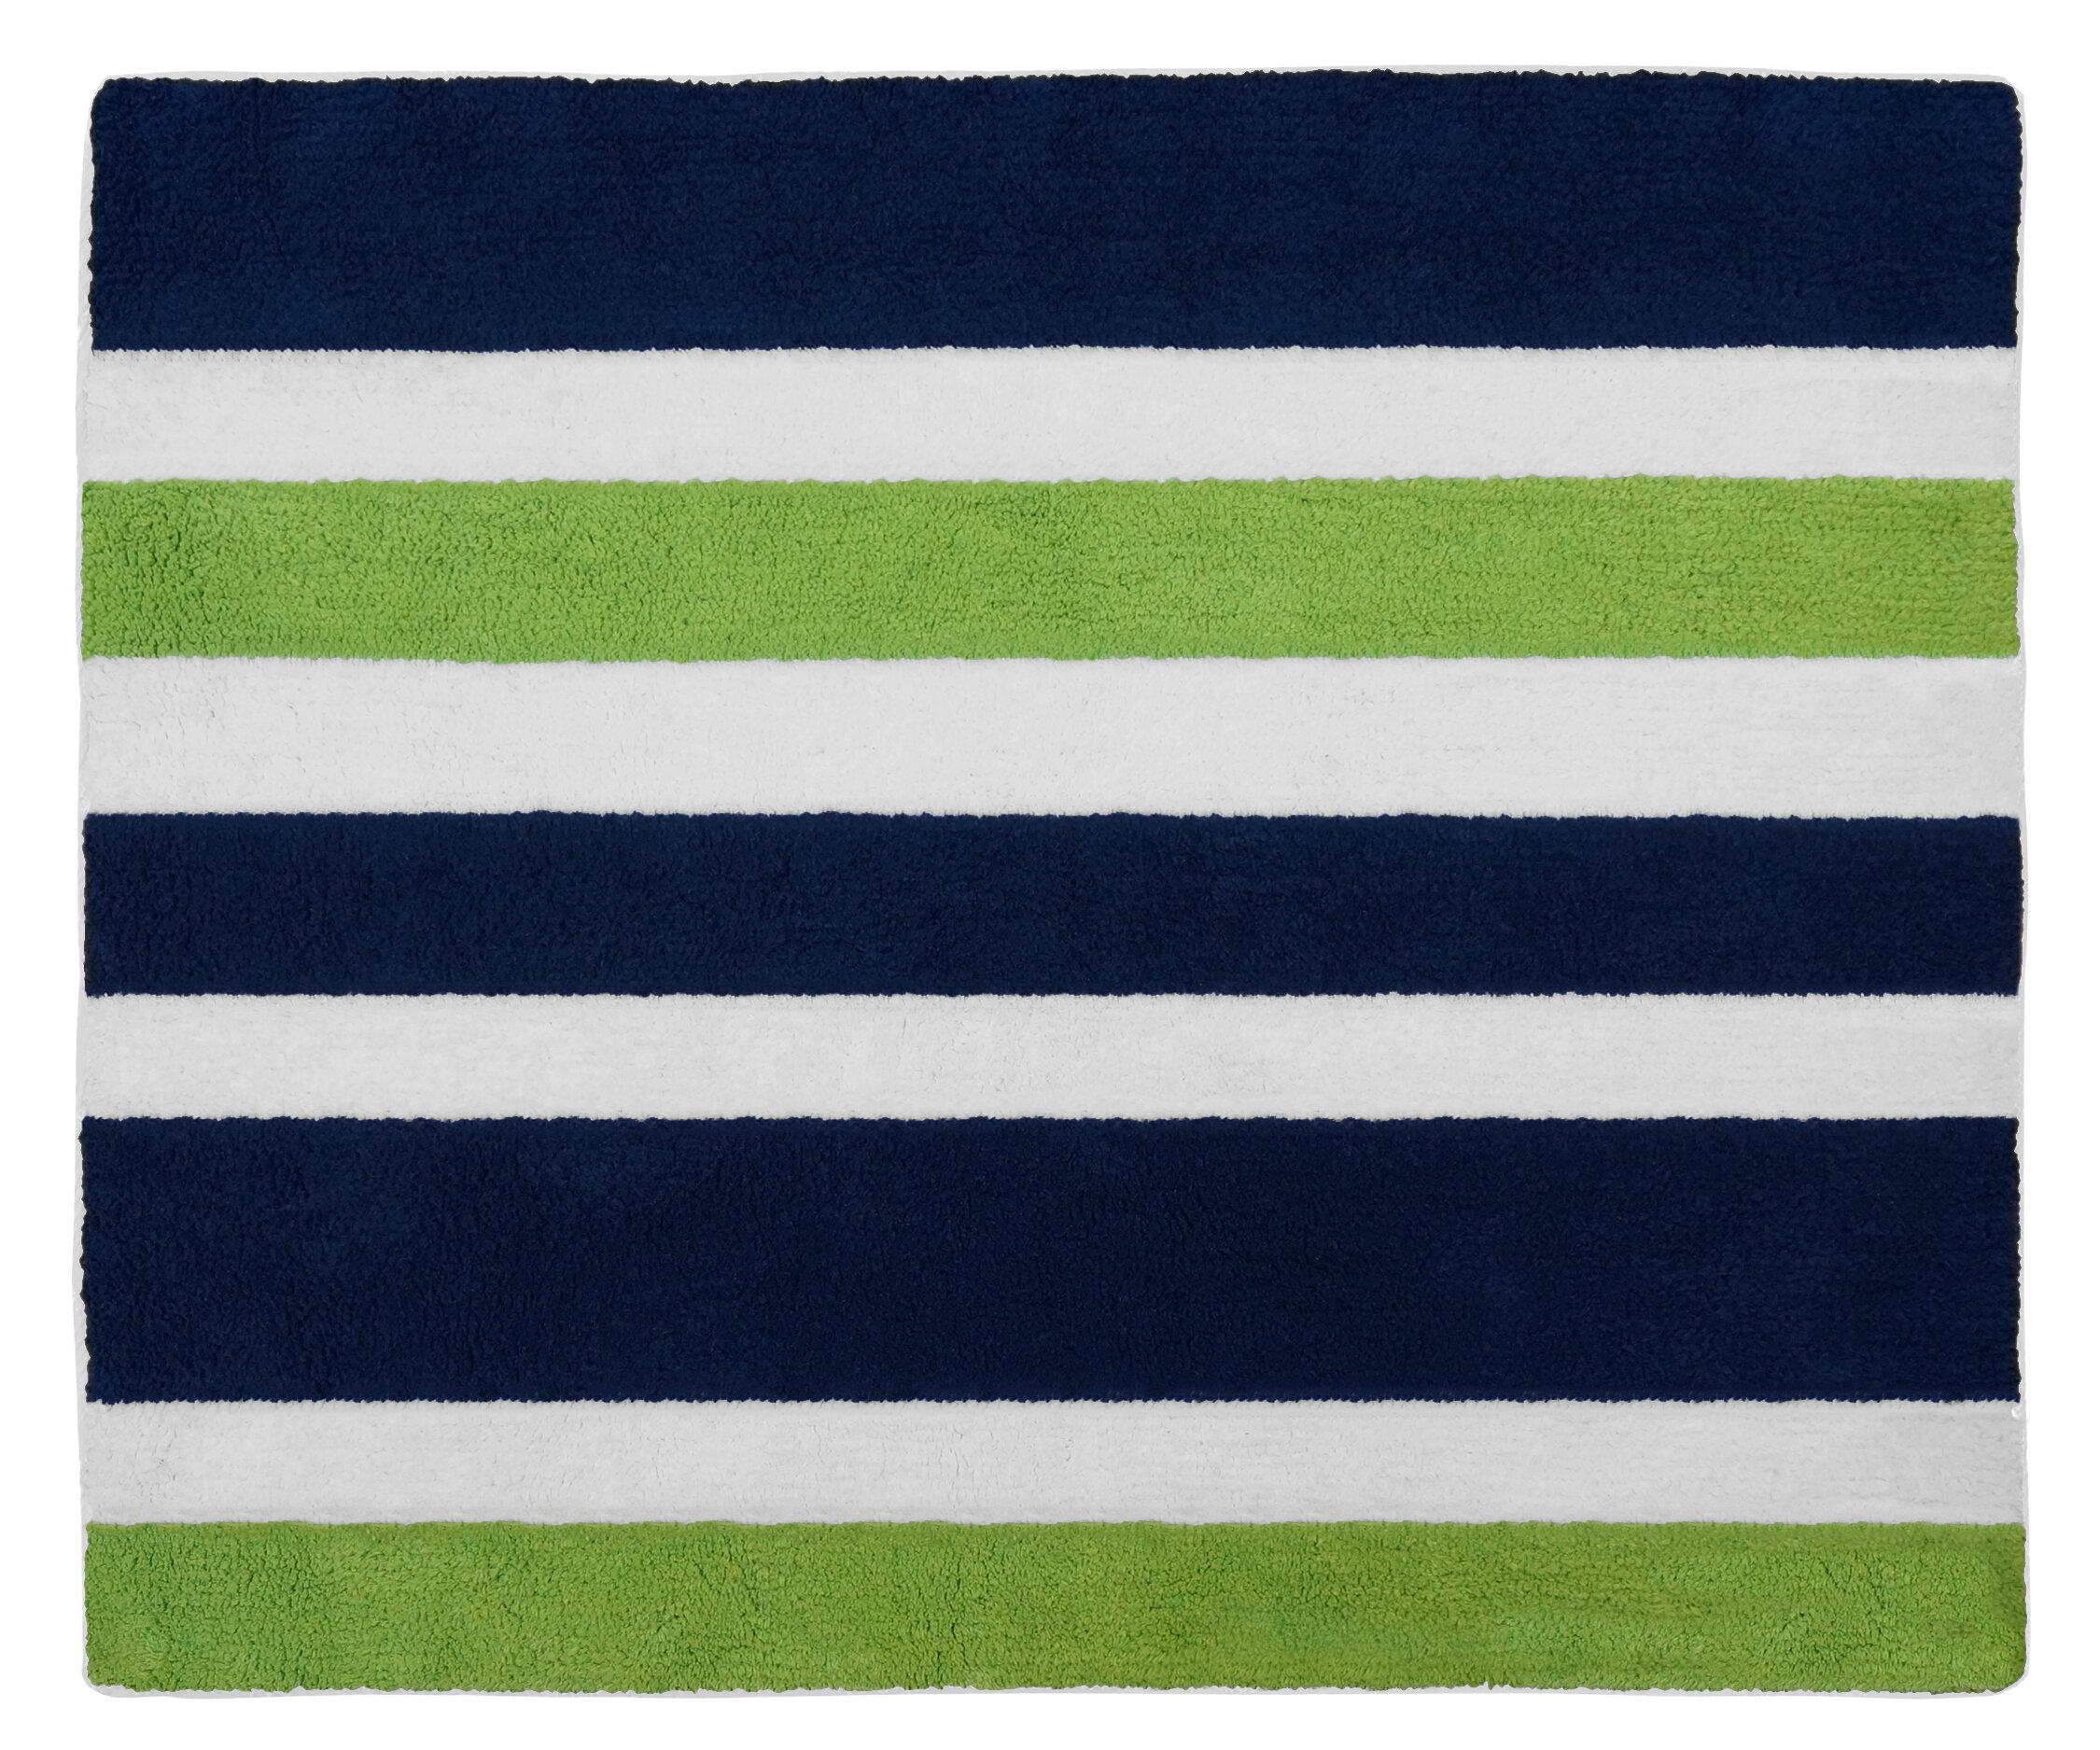 Sweet Jojo Designs Navy Blue And Lime Green Stripe Bath Rug Reviews Wayfair